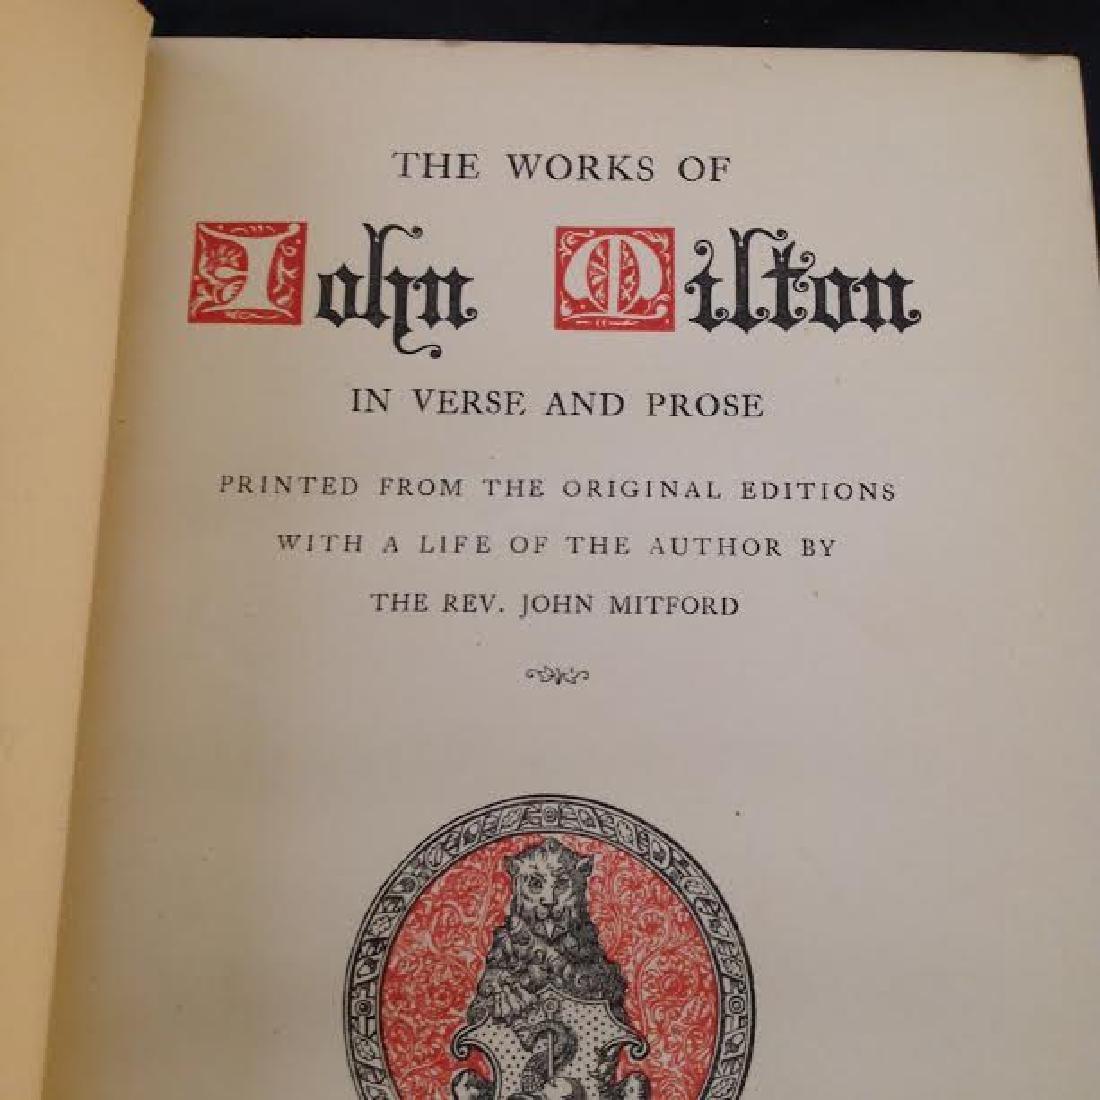 The Poetical Works Of John Milton 1867 Vol.11 - 5